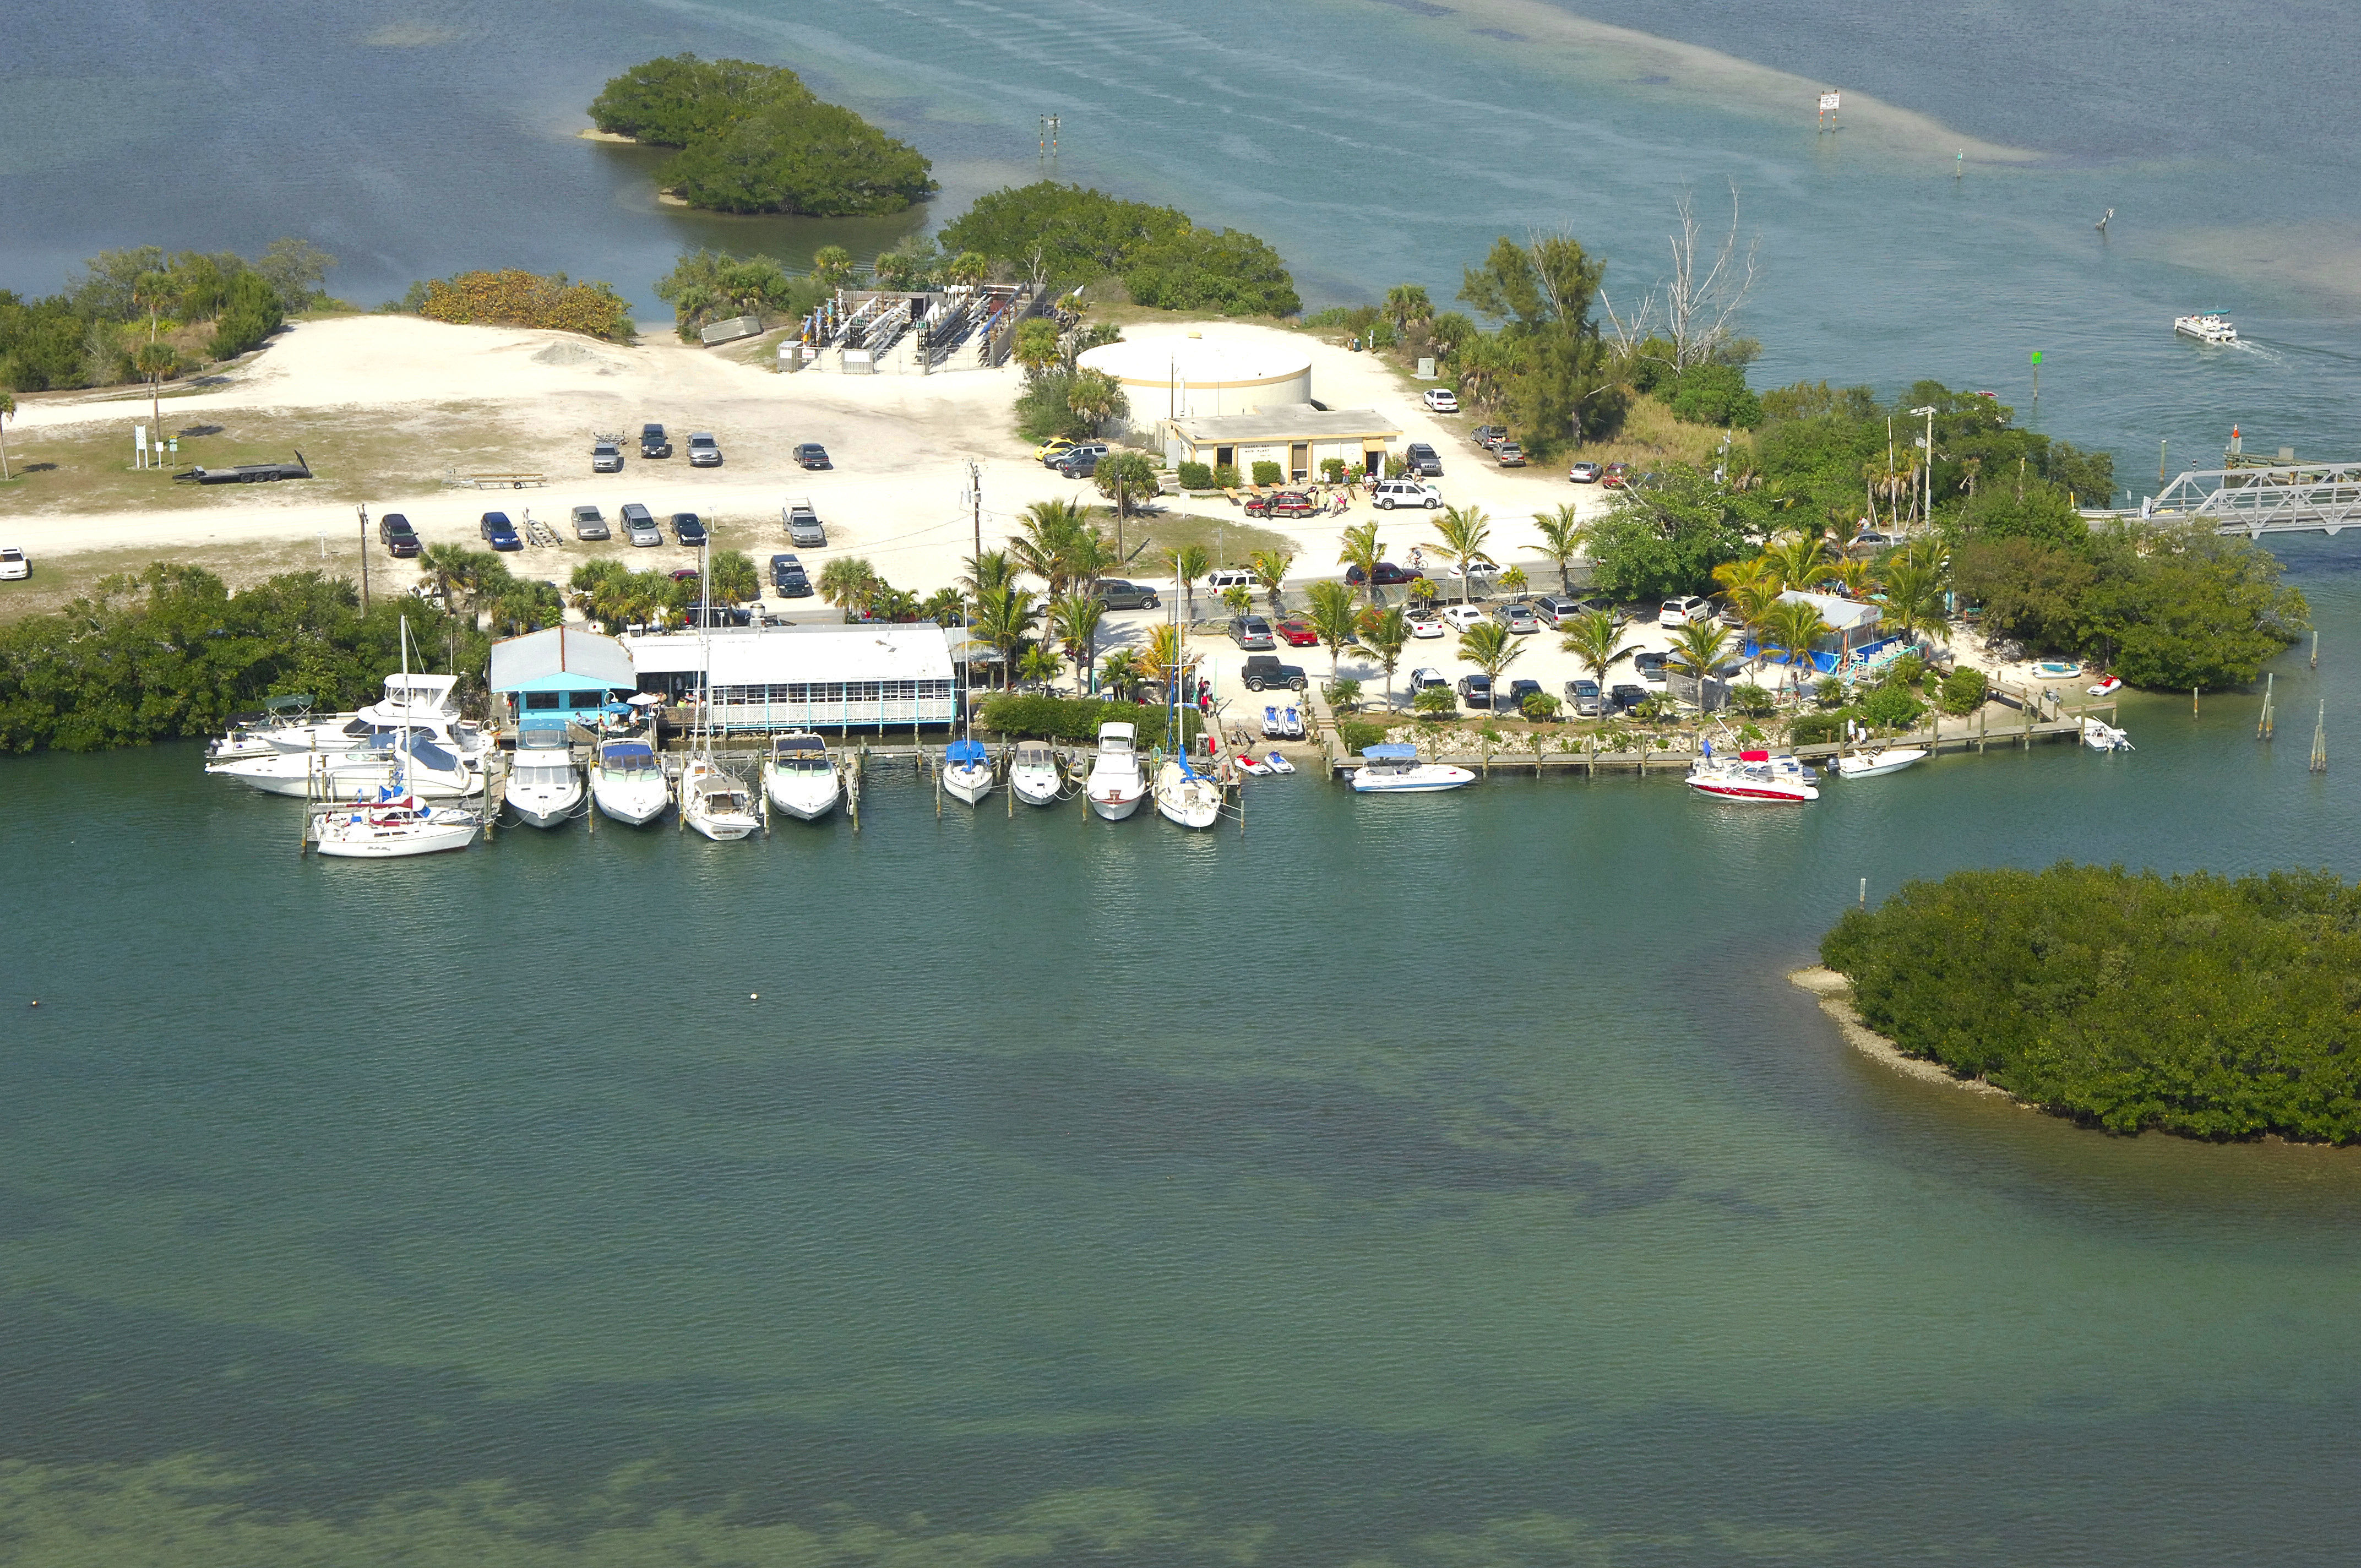 Blackburn Point Marina in Osprey, FL, United States - Marina Reviews